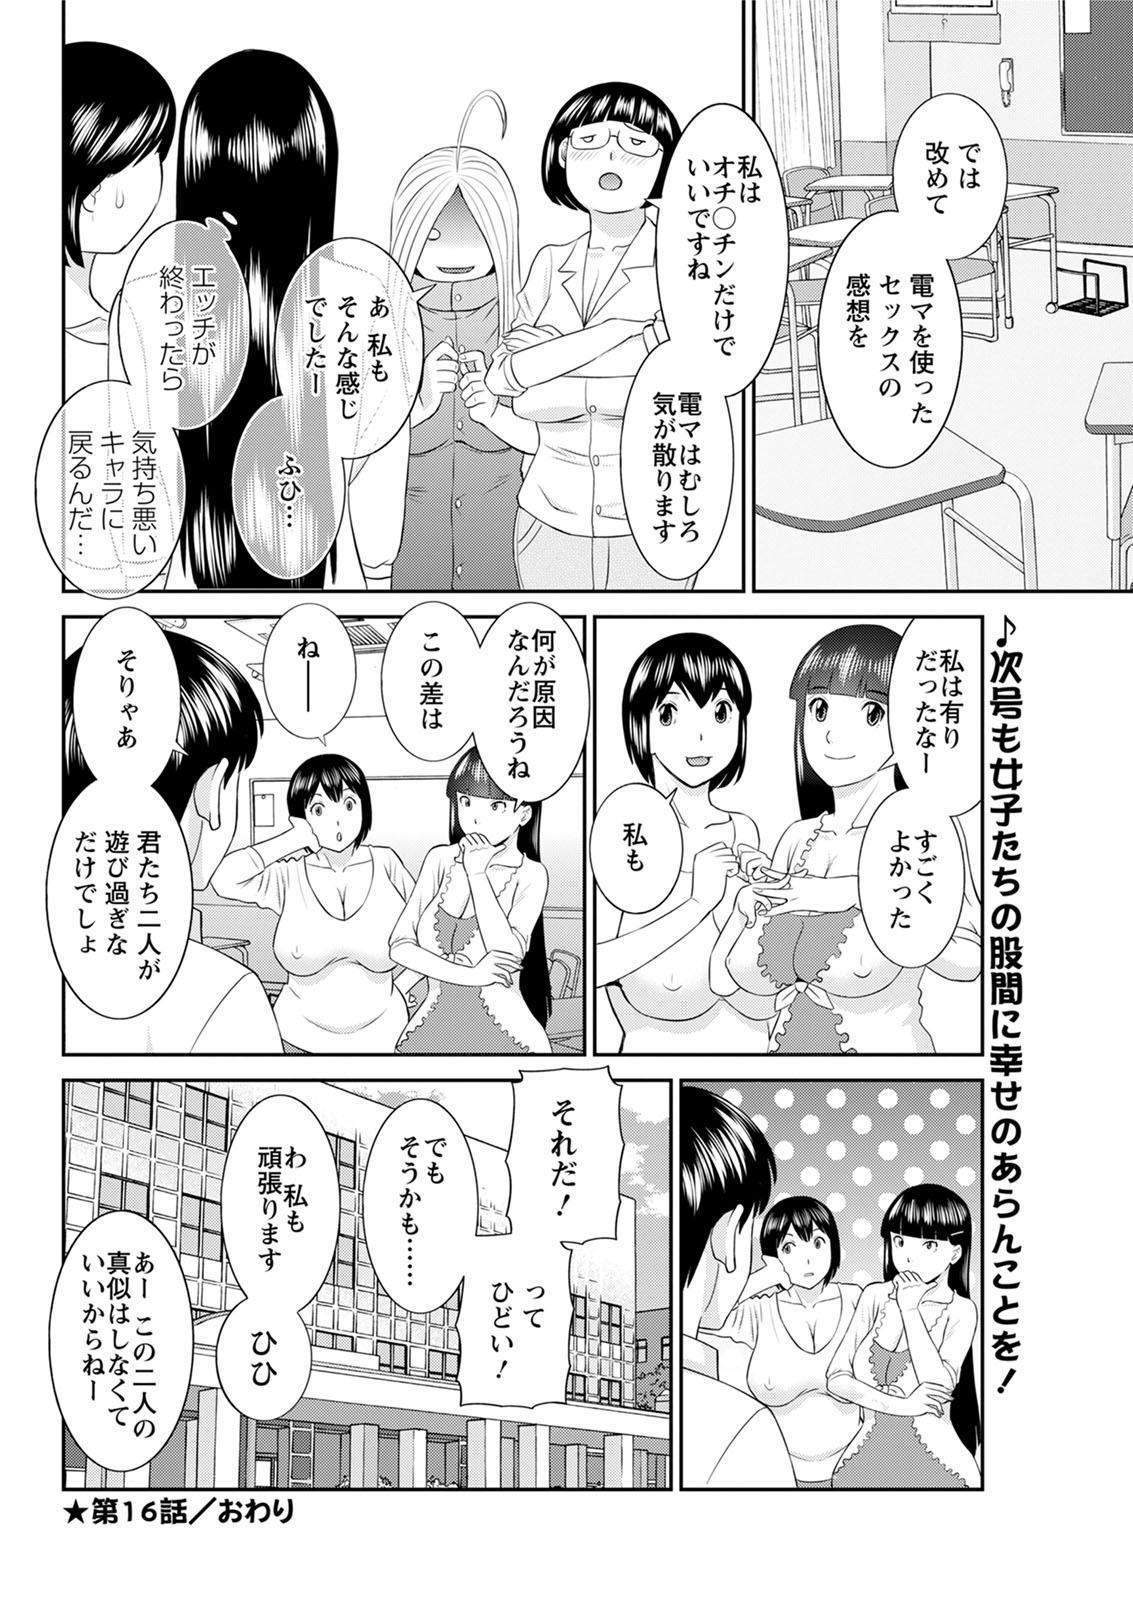 [Kawamori Misaki] Kaikan Hitotsuma Gakuen Ch. 1-6, 8-20 [Digital] 274